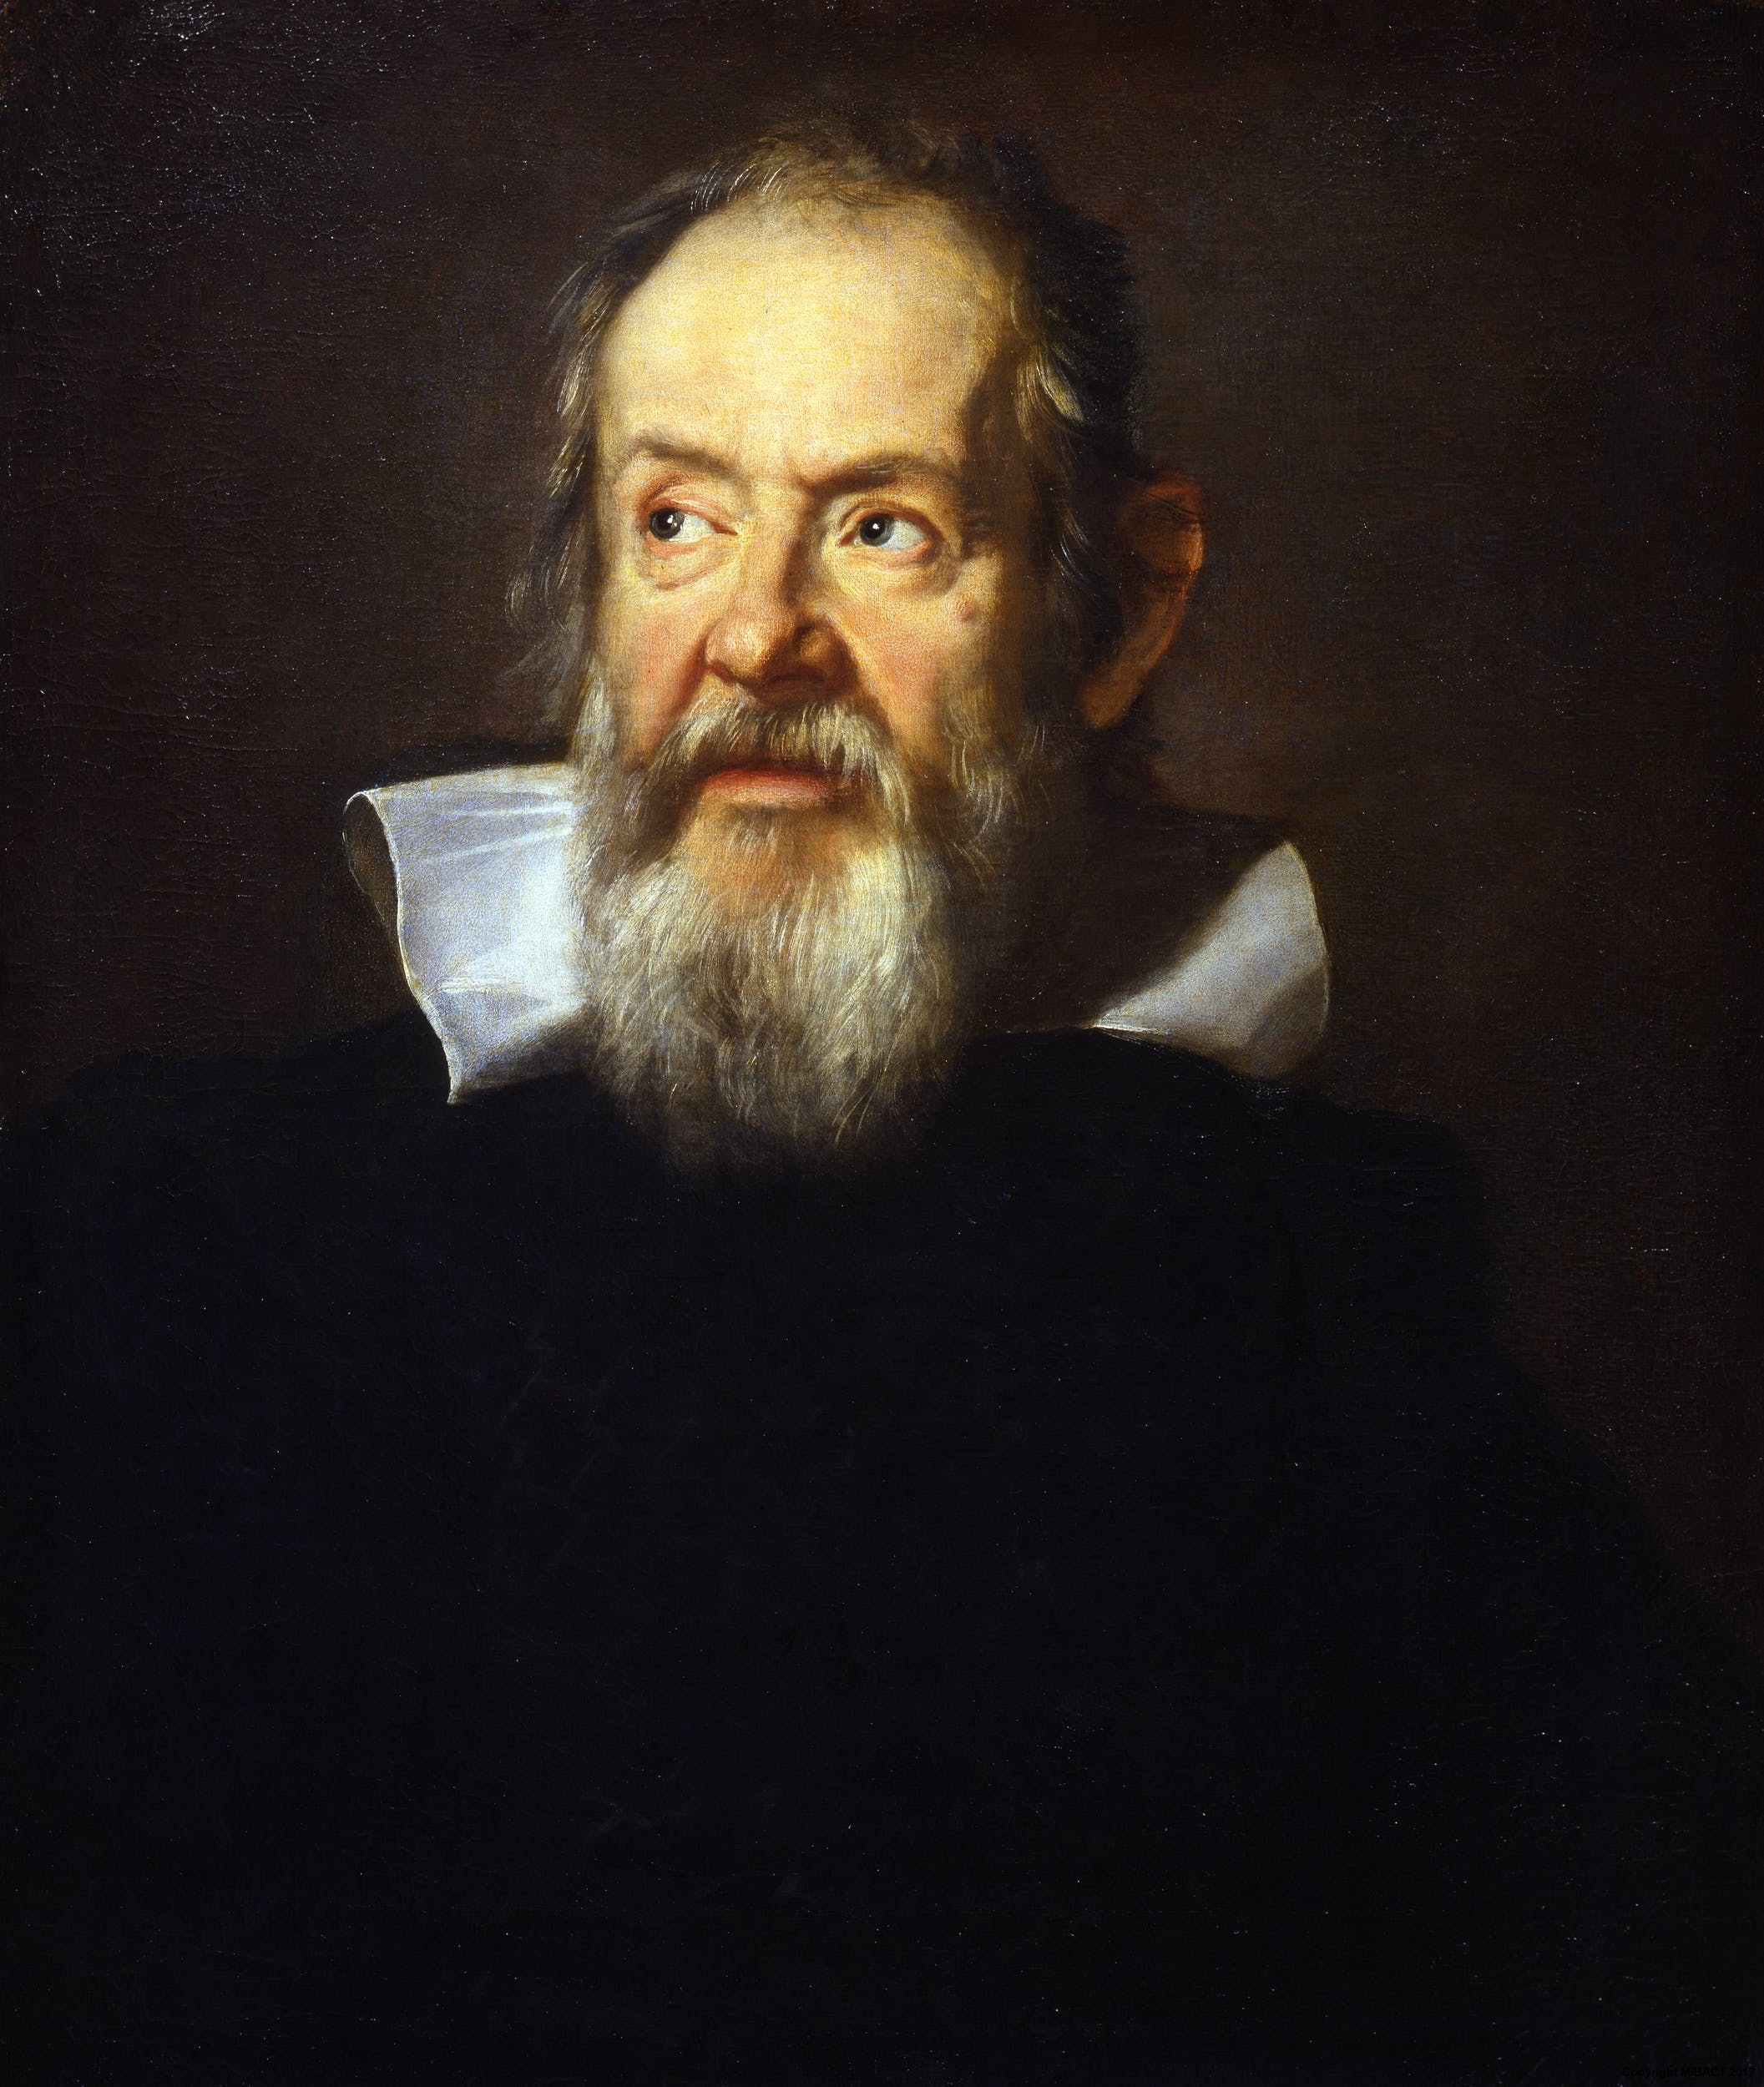 Portrait of Galileo Galilei by Justus Sustermans | Artworks ...